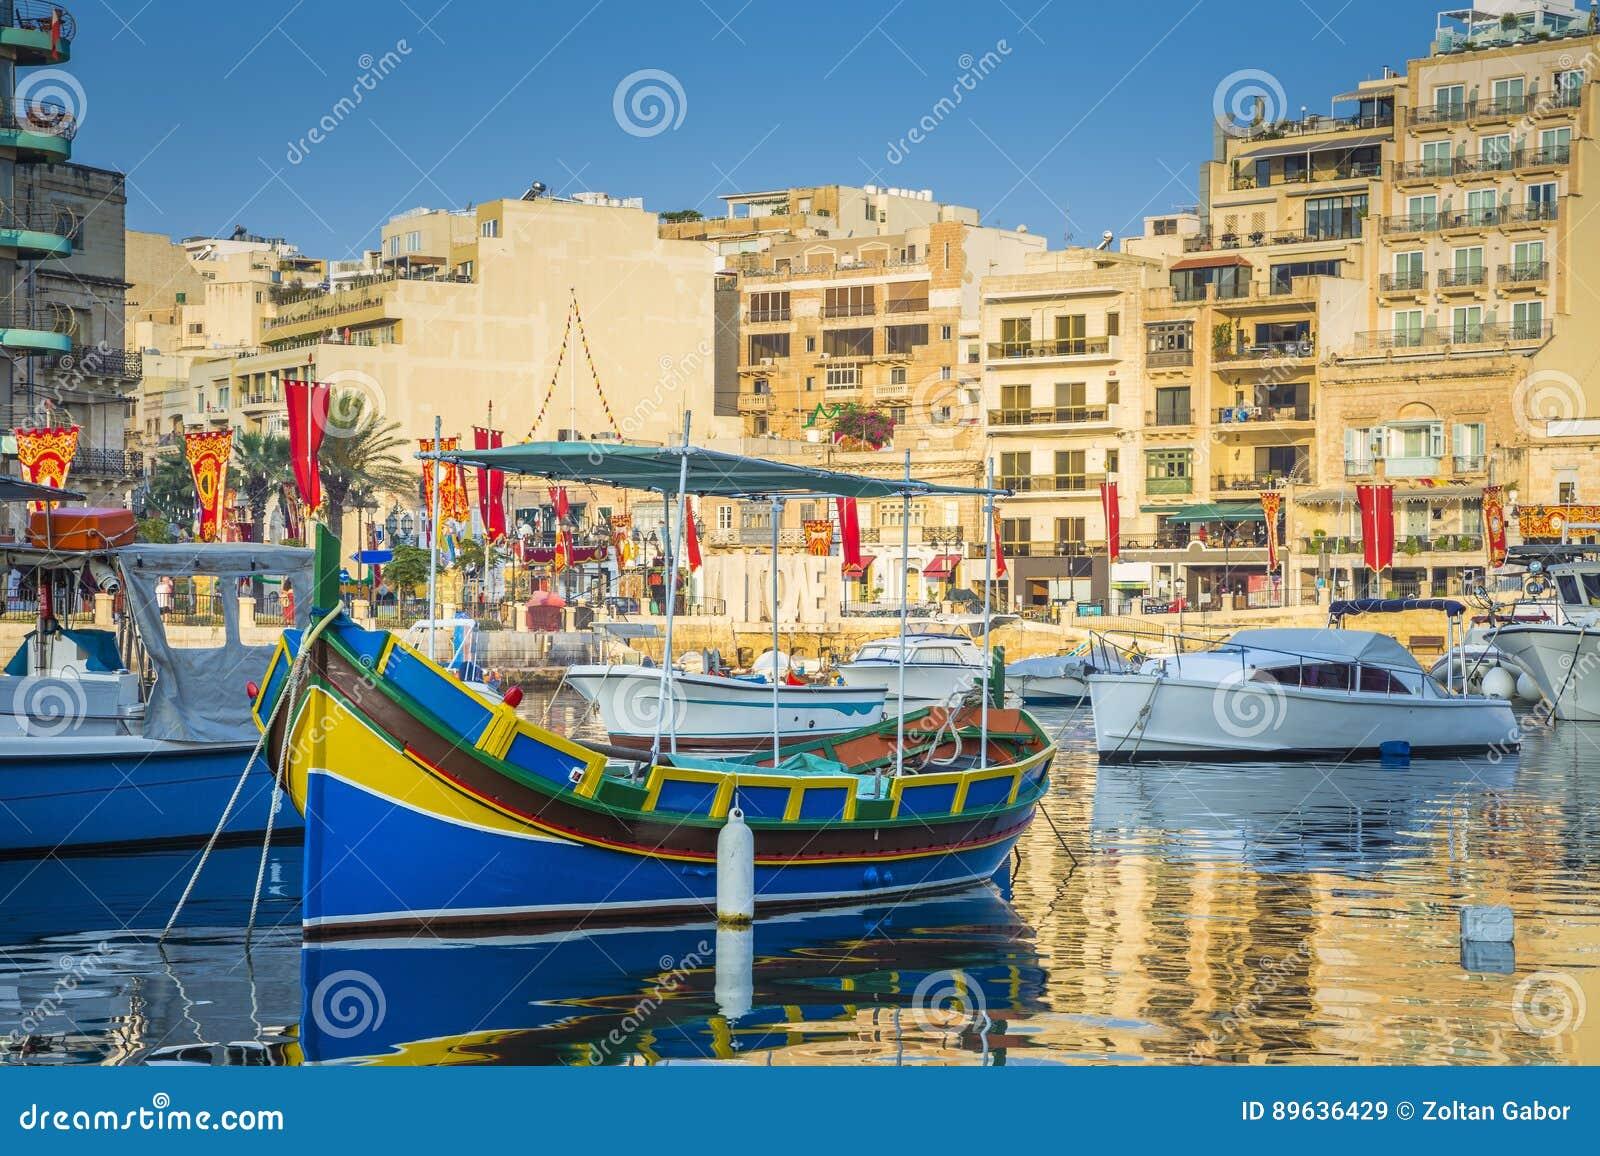 St.Julian`s, Malta - Colorful Luzzu fishing boats at Spinola bay